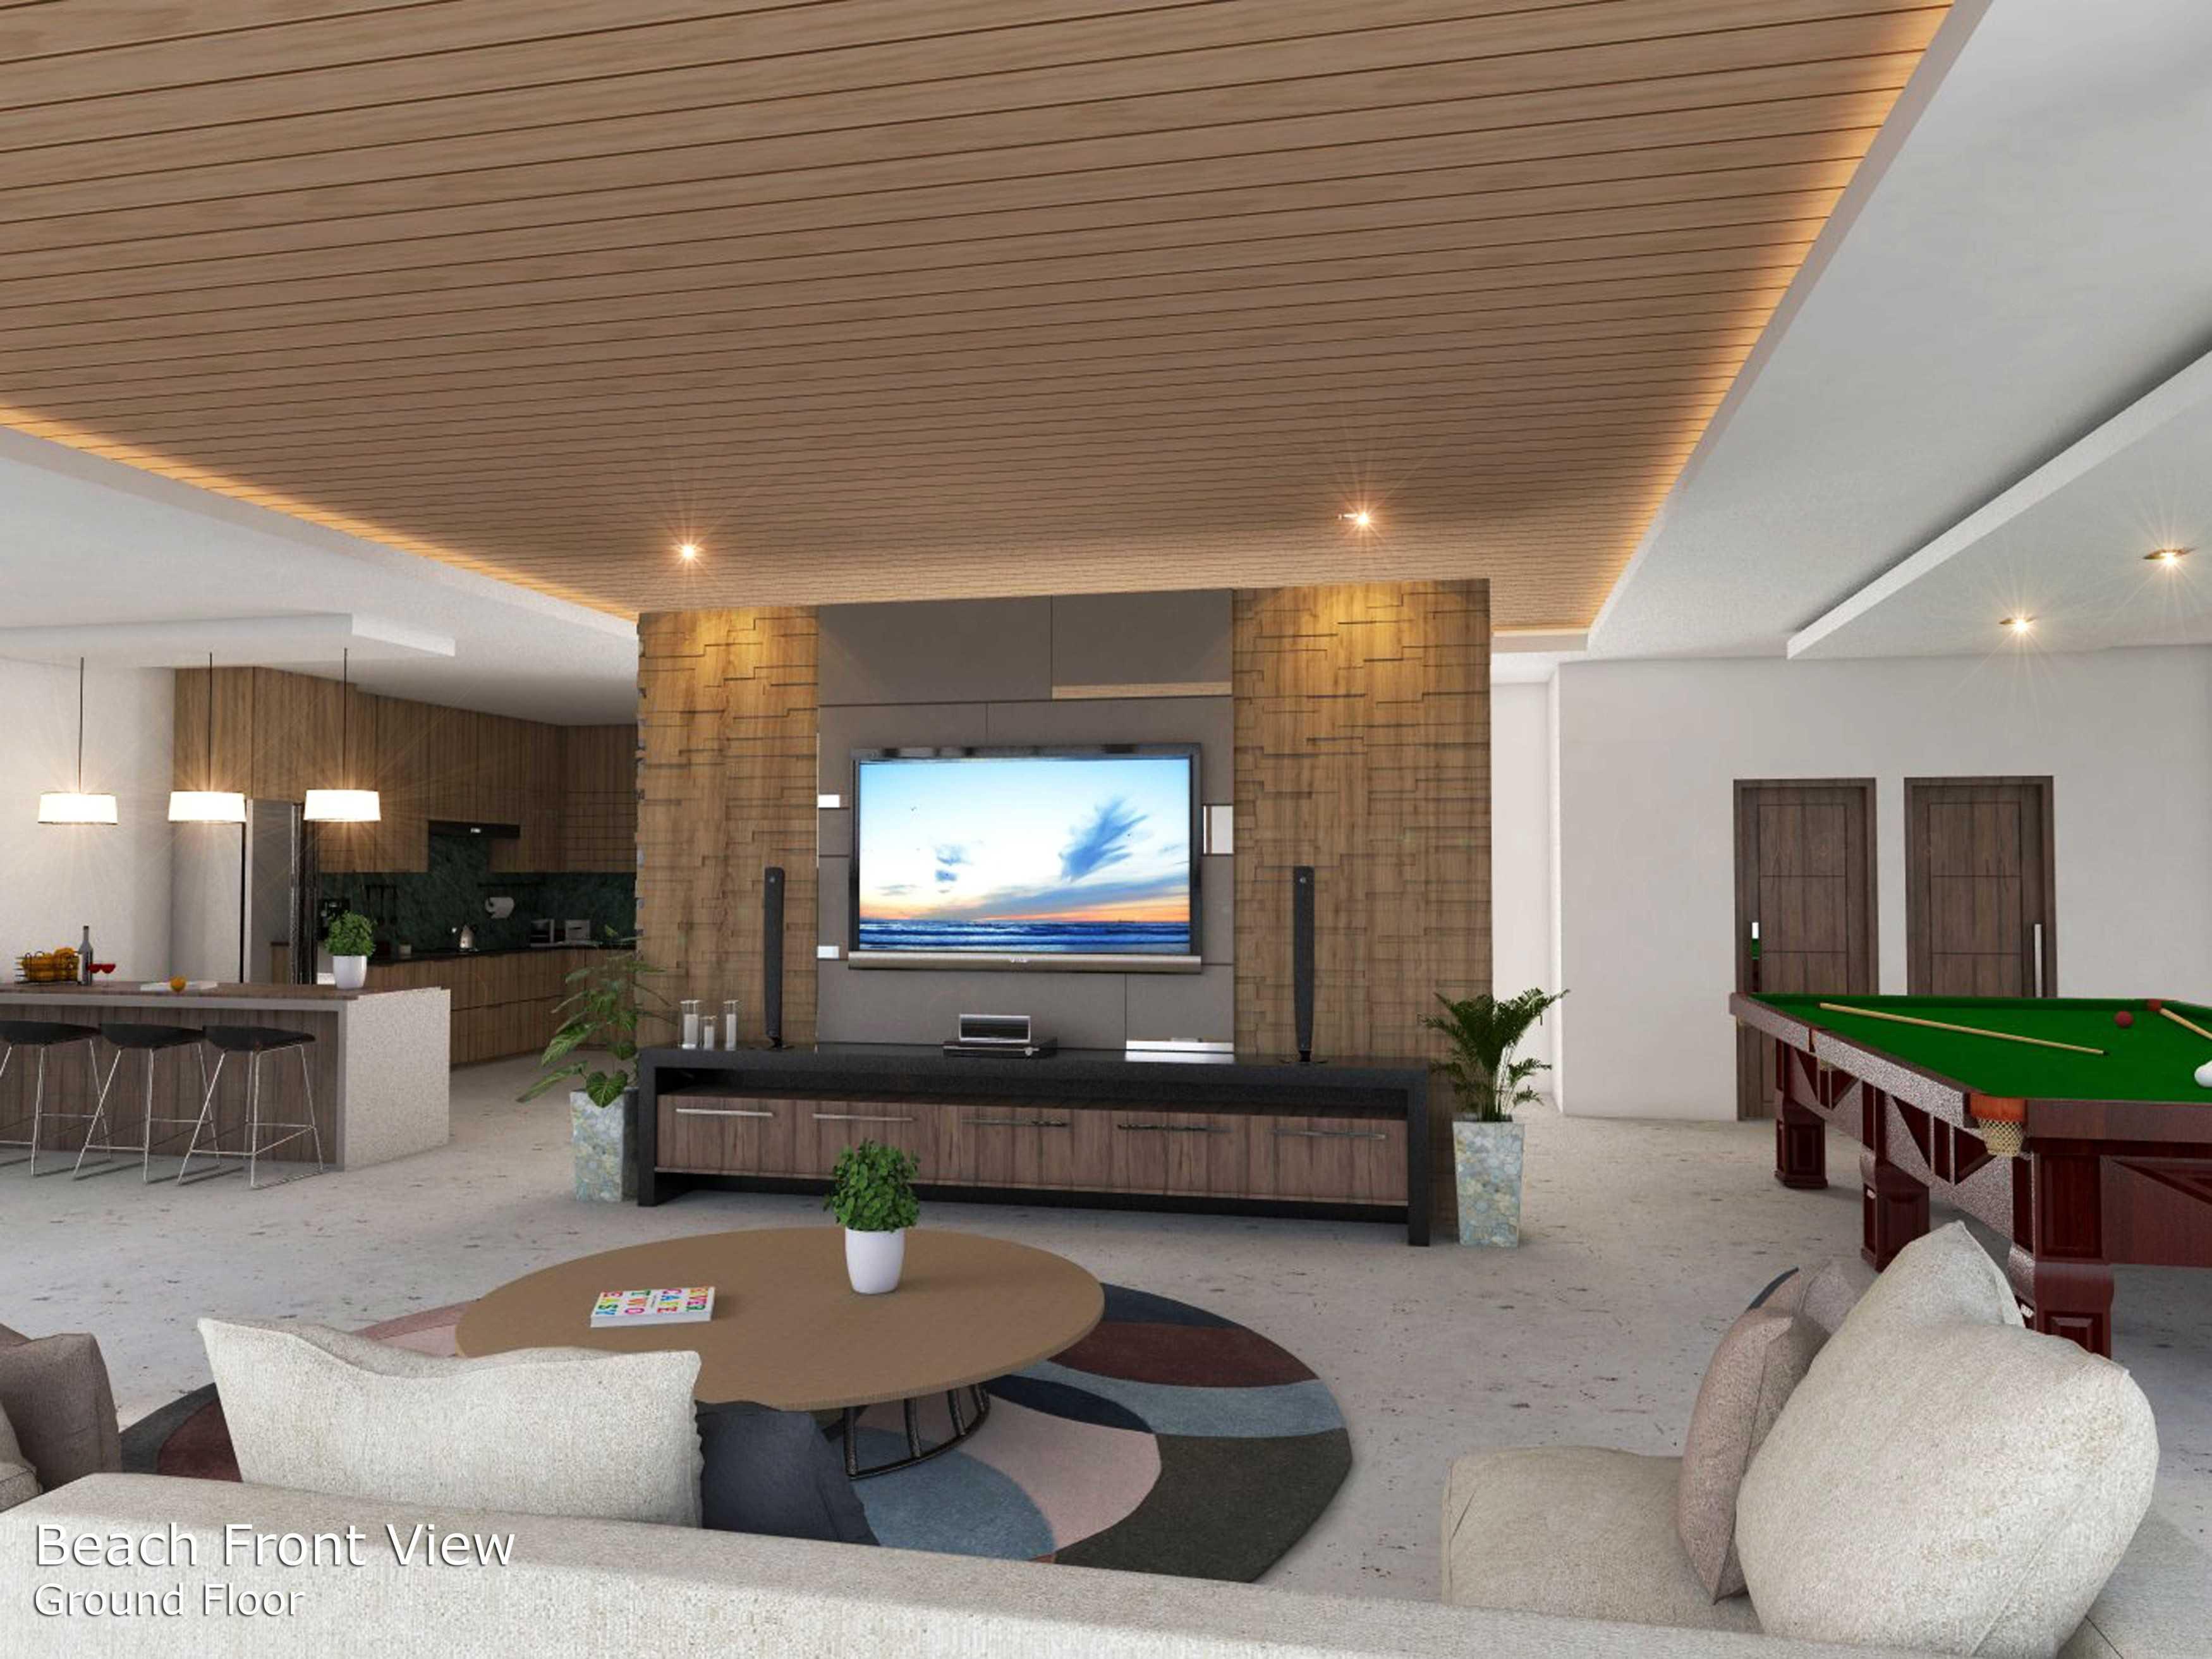 I Gede Yogiantara D. A Desain Interior Hotel Air Grand Paradise Sanur, Kec. Denpasar Sel., Kota Denpasar, Bali, Indonesia Sanur, Kec. Denpasar Sel., Kota Denpasar, Bali, Indonesia I-Gede-Yogiantara-D-A-Desain-Interior-Hotel-Air-Grand-Paradise   109414